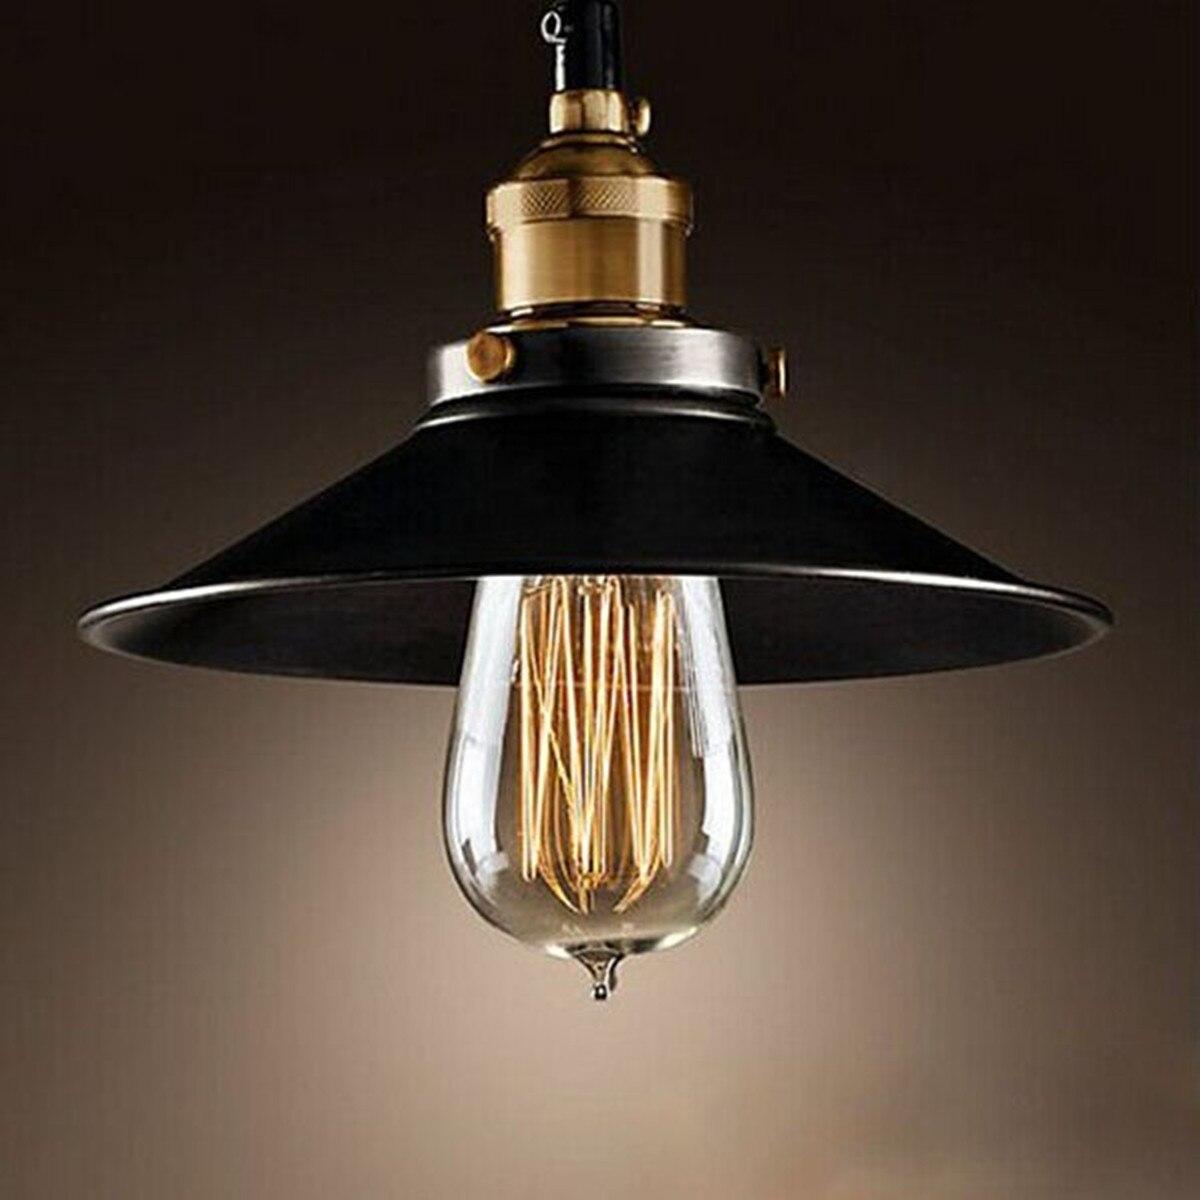 American Countryside Vintage Industrial Pendant Lights Home Restaurant Bar Lamp american countryside industrial vintage